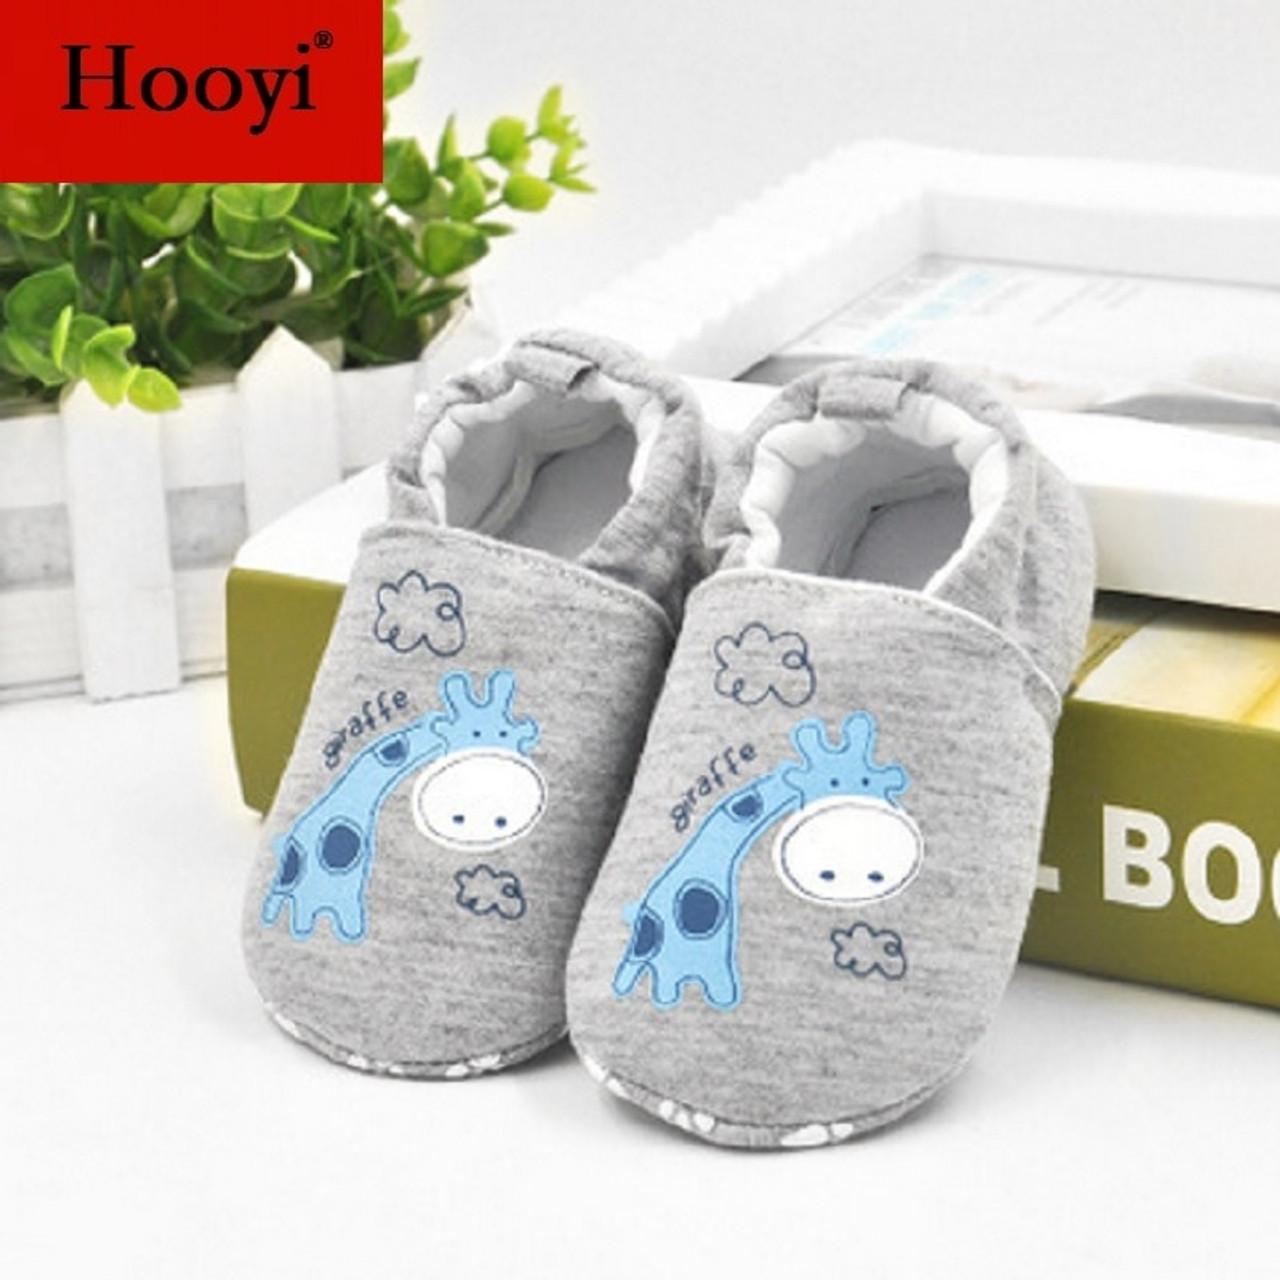 056487dbec08 ... Hooyi Animal Baby Boy shoe Newborn shoes 0 1 2 Year Infant Girl Boots  Bebe First ...